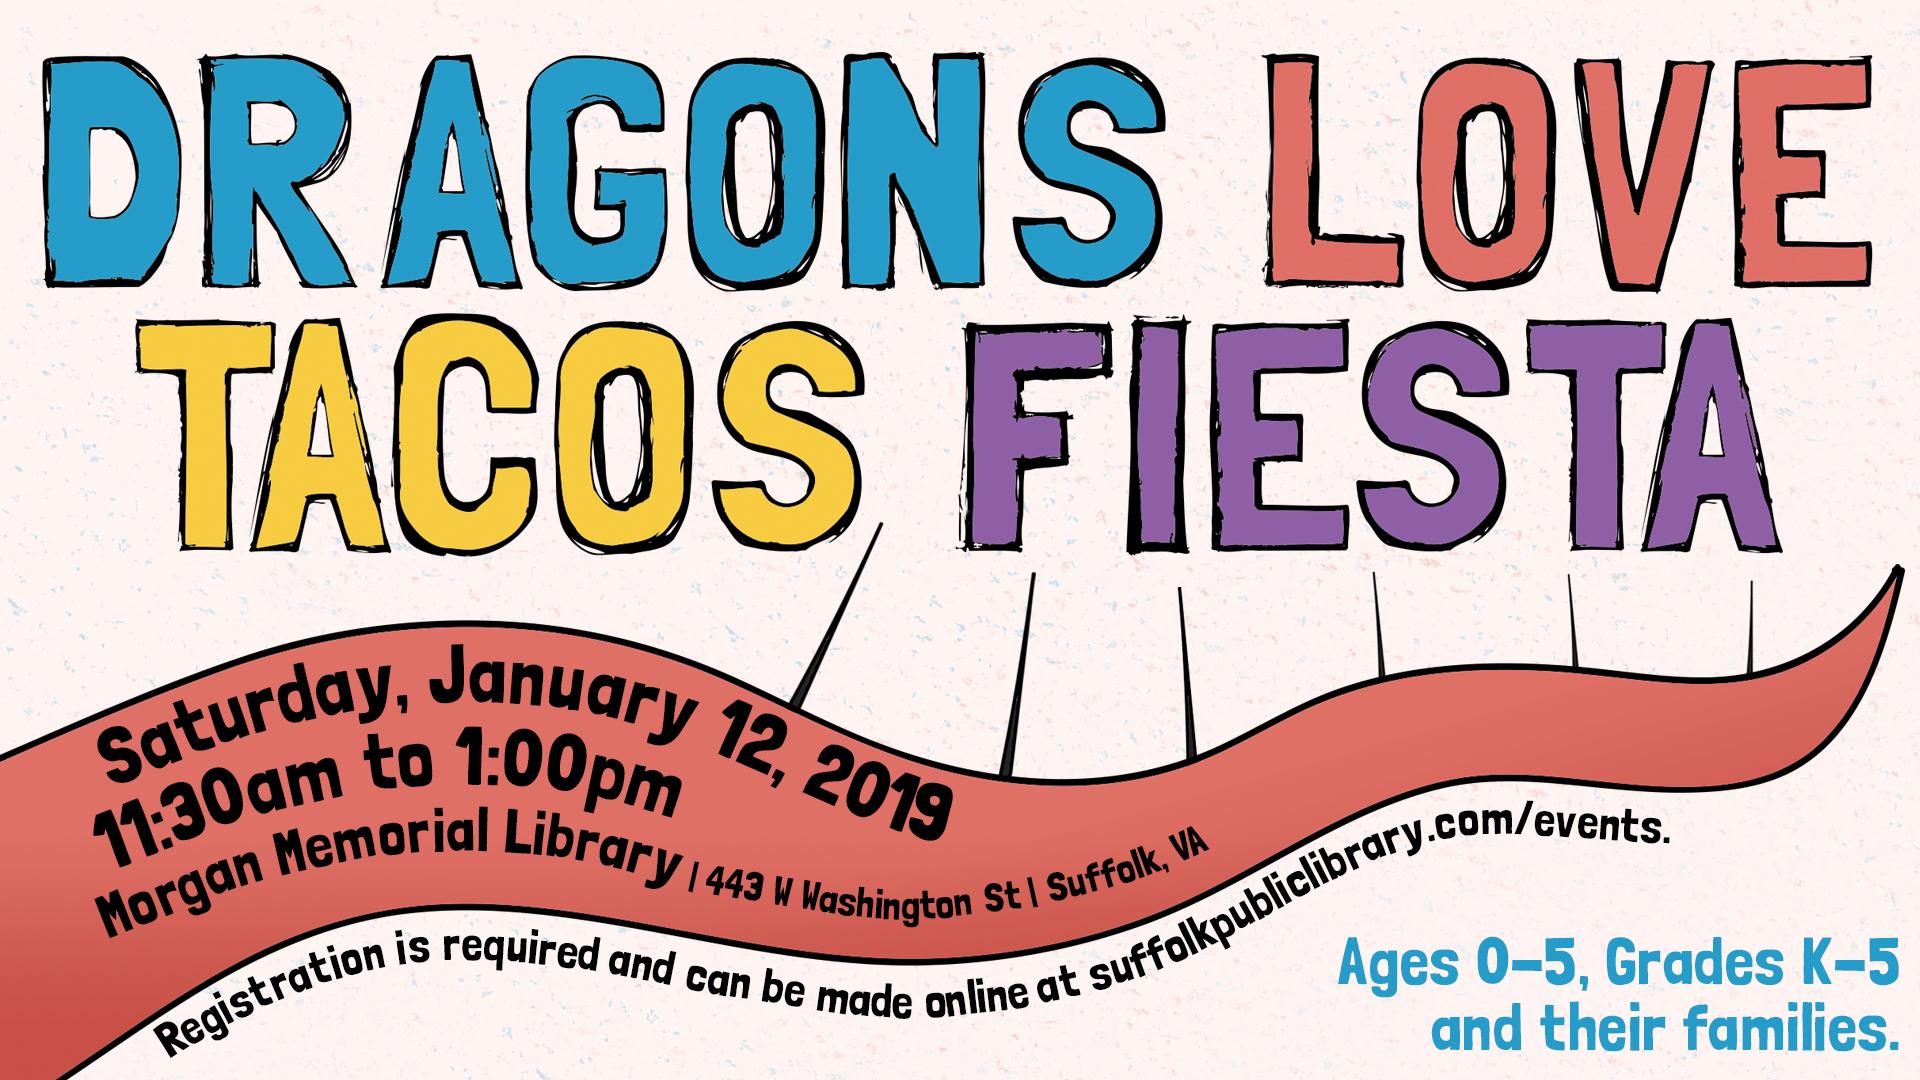 Dragon's Love Tacos Fiesta Storytime